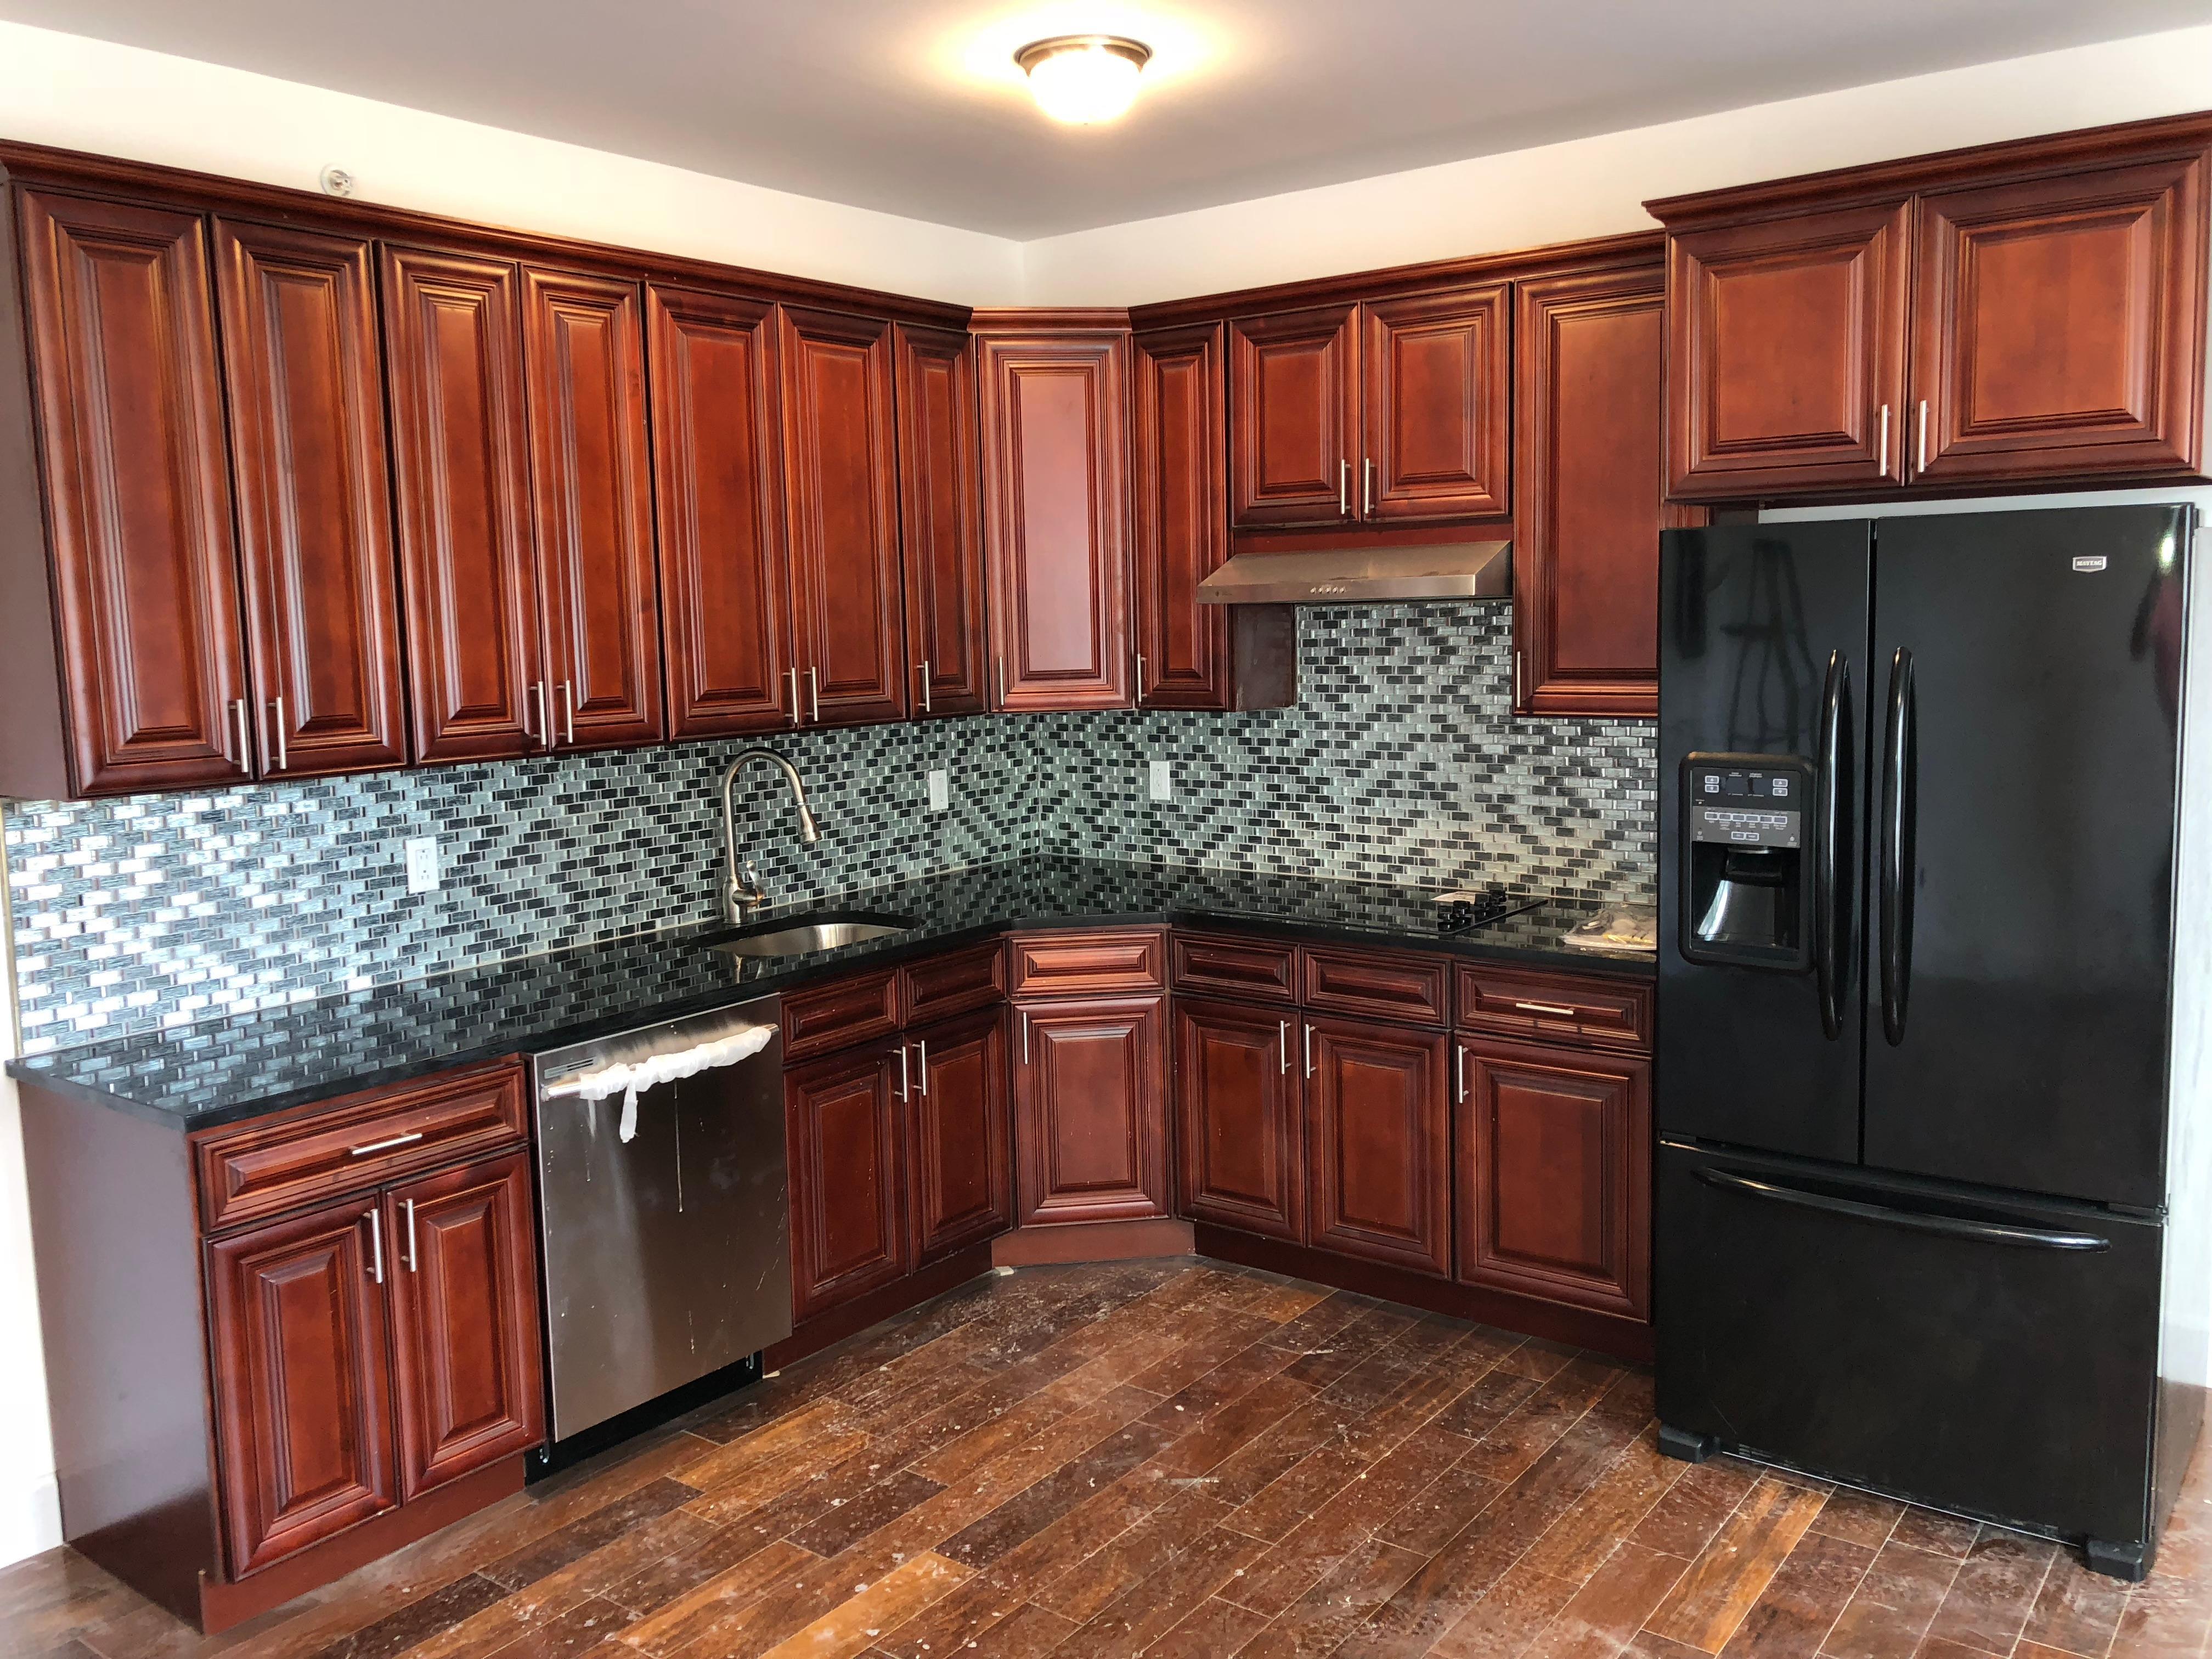 Capital Kitchen & Granite Inc. image 3